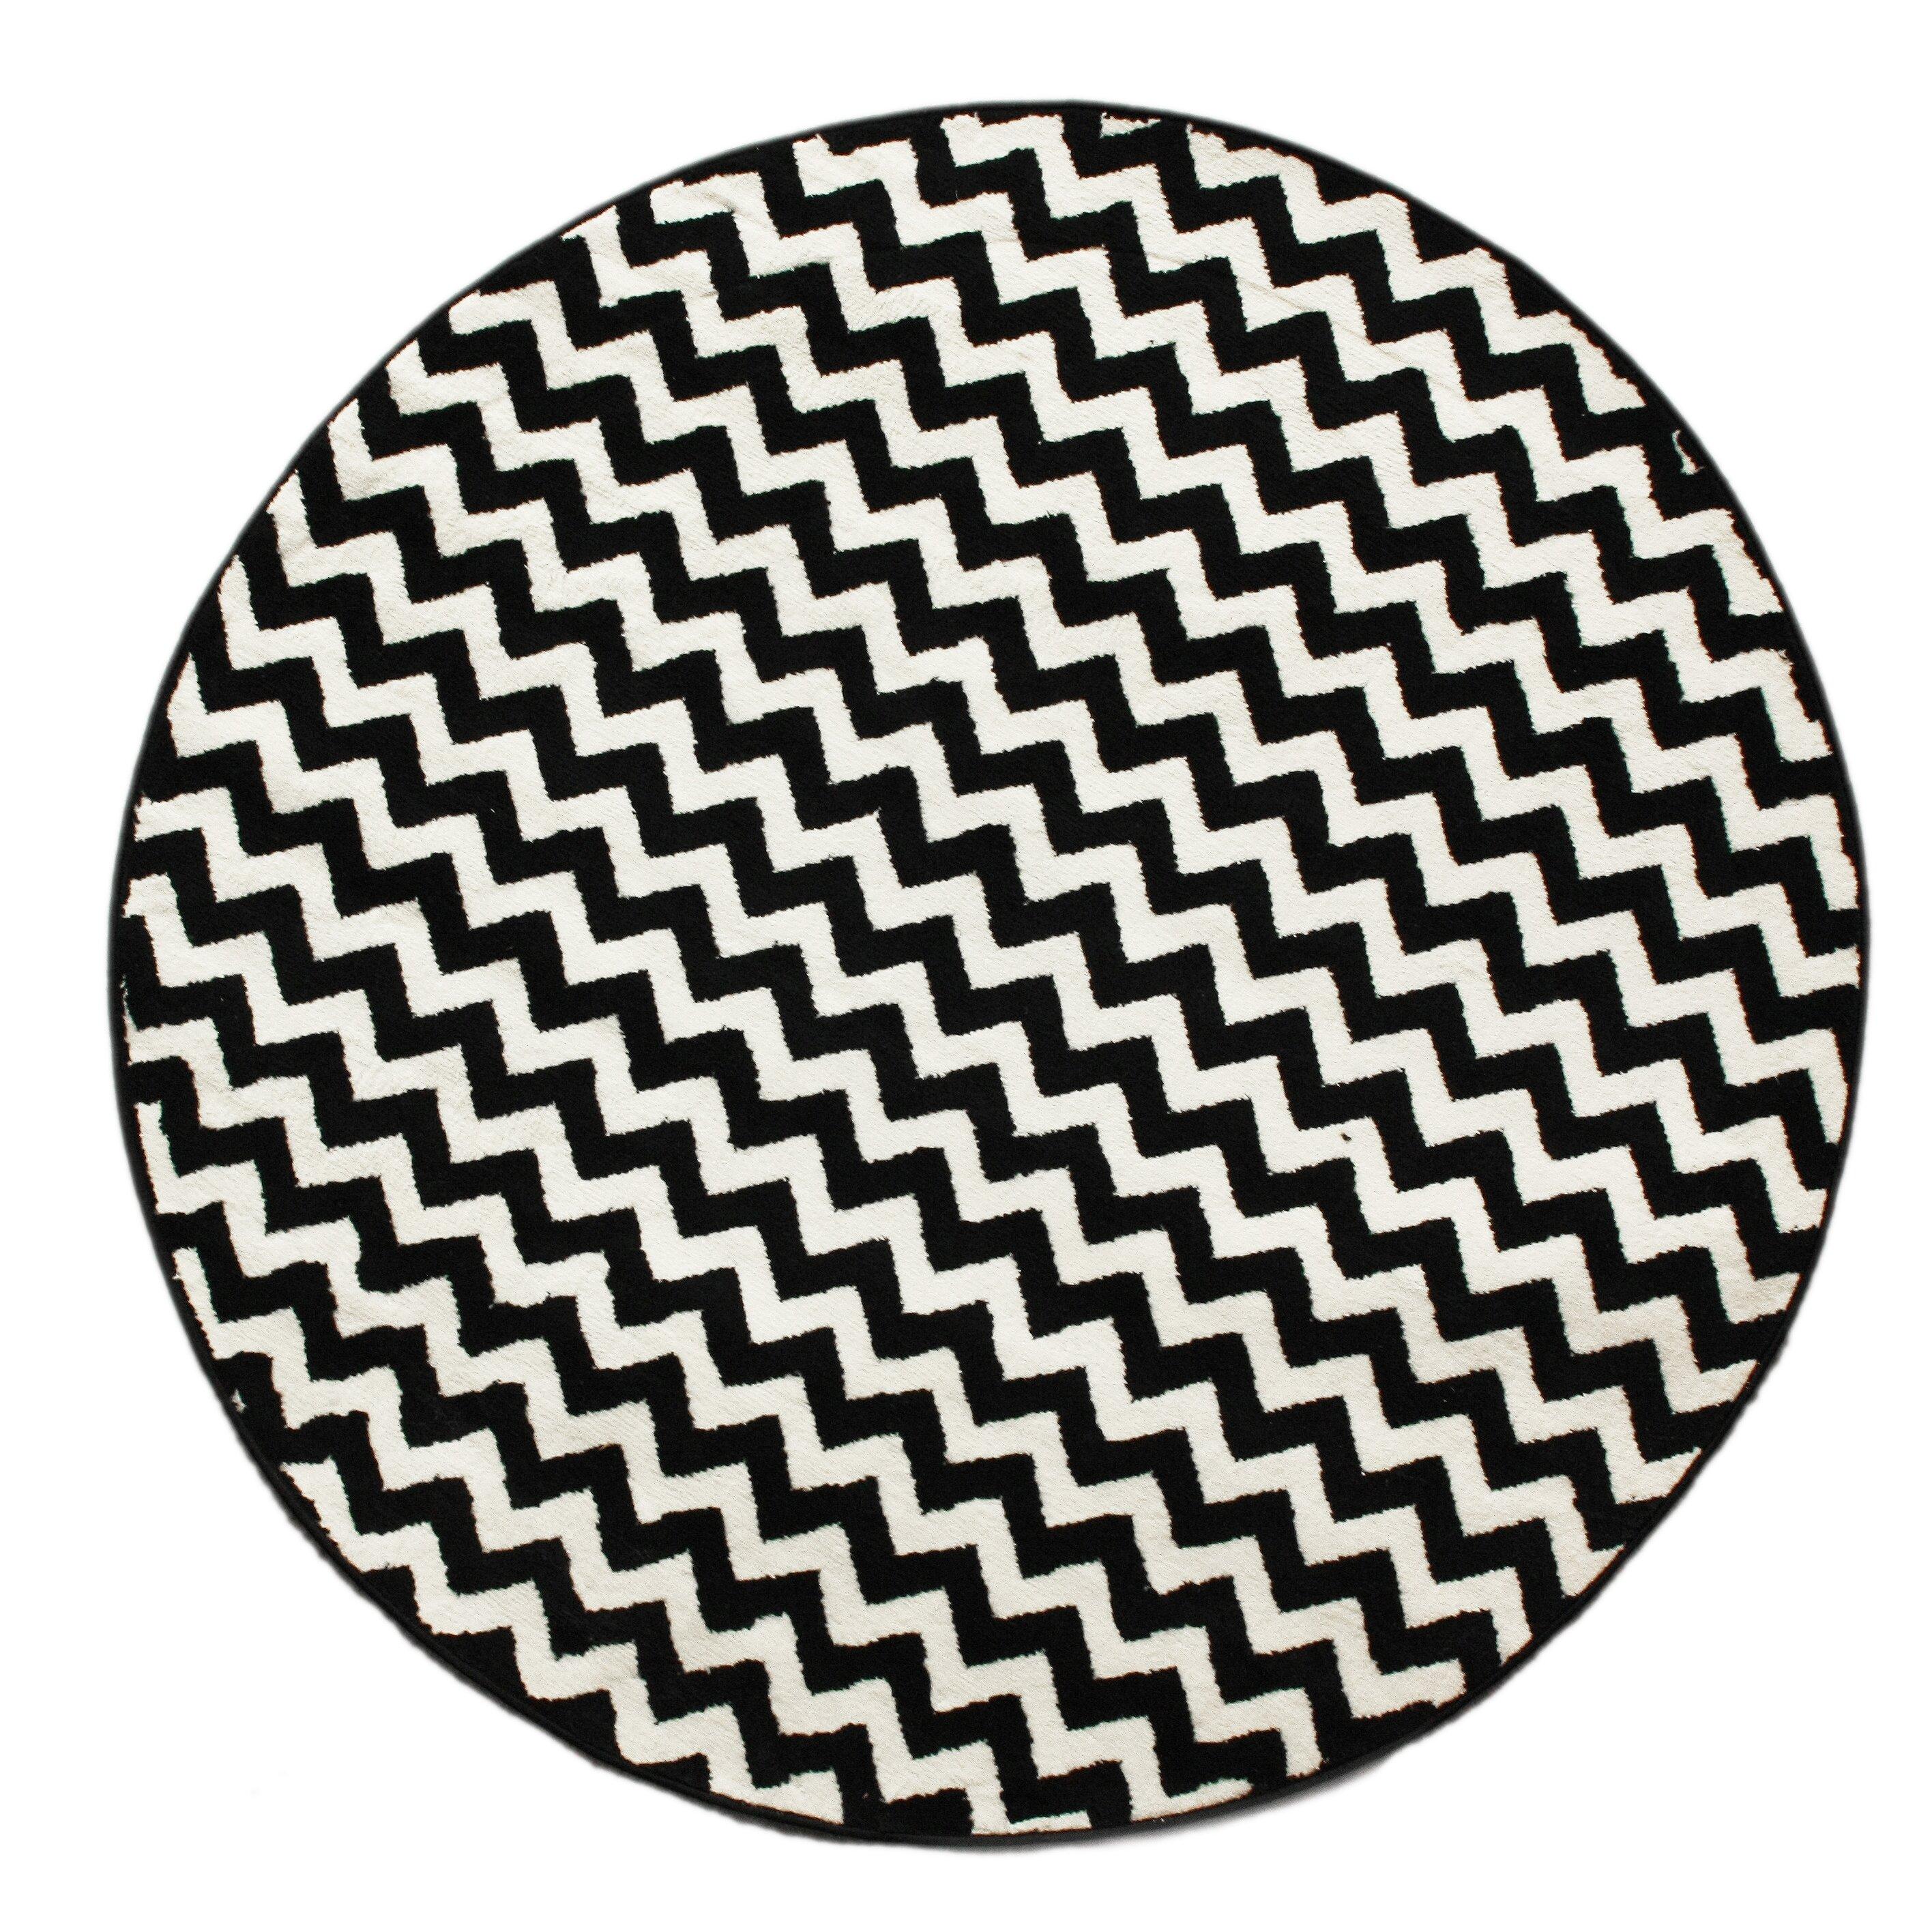 Nuloom Black And White Rug: NuLOOM Kinder Chevron Ivory/Black Area Rug & Reviews